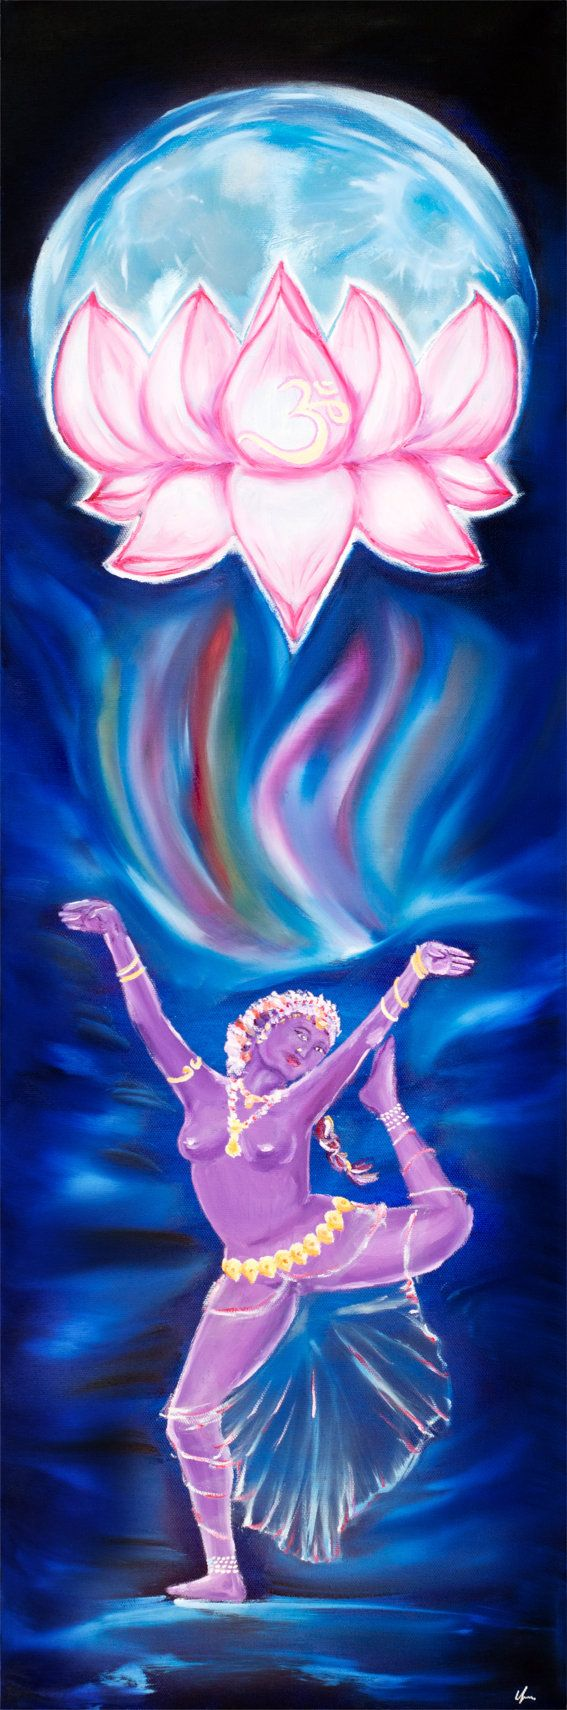 Devi  Lotus Moon Dancer Series by MissSharda on Etsy